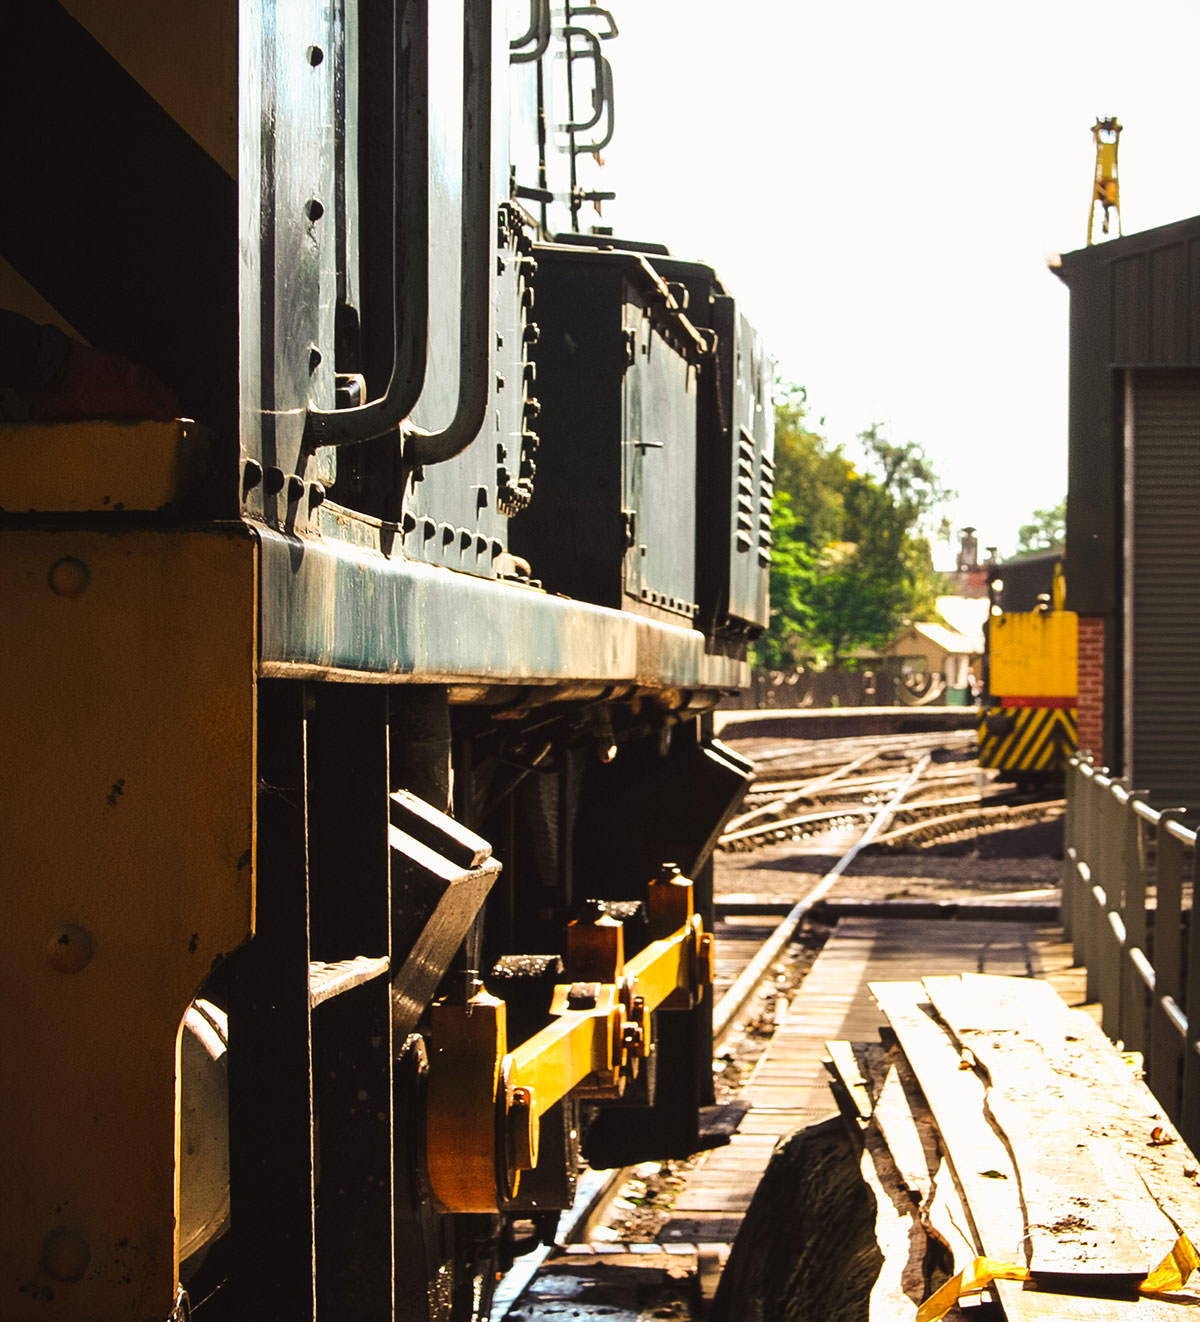 September-NYMR-Nigel-Gresley-A4-Trains-19